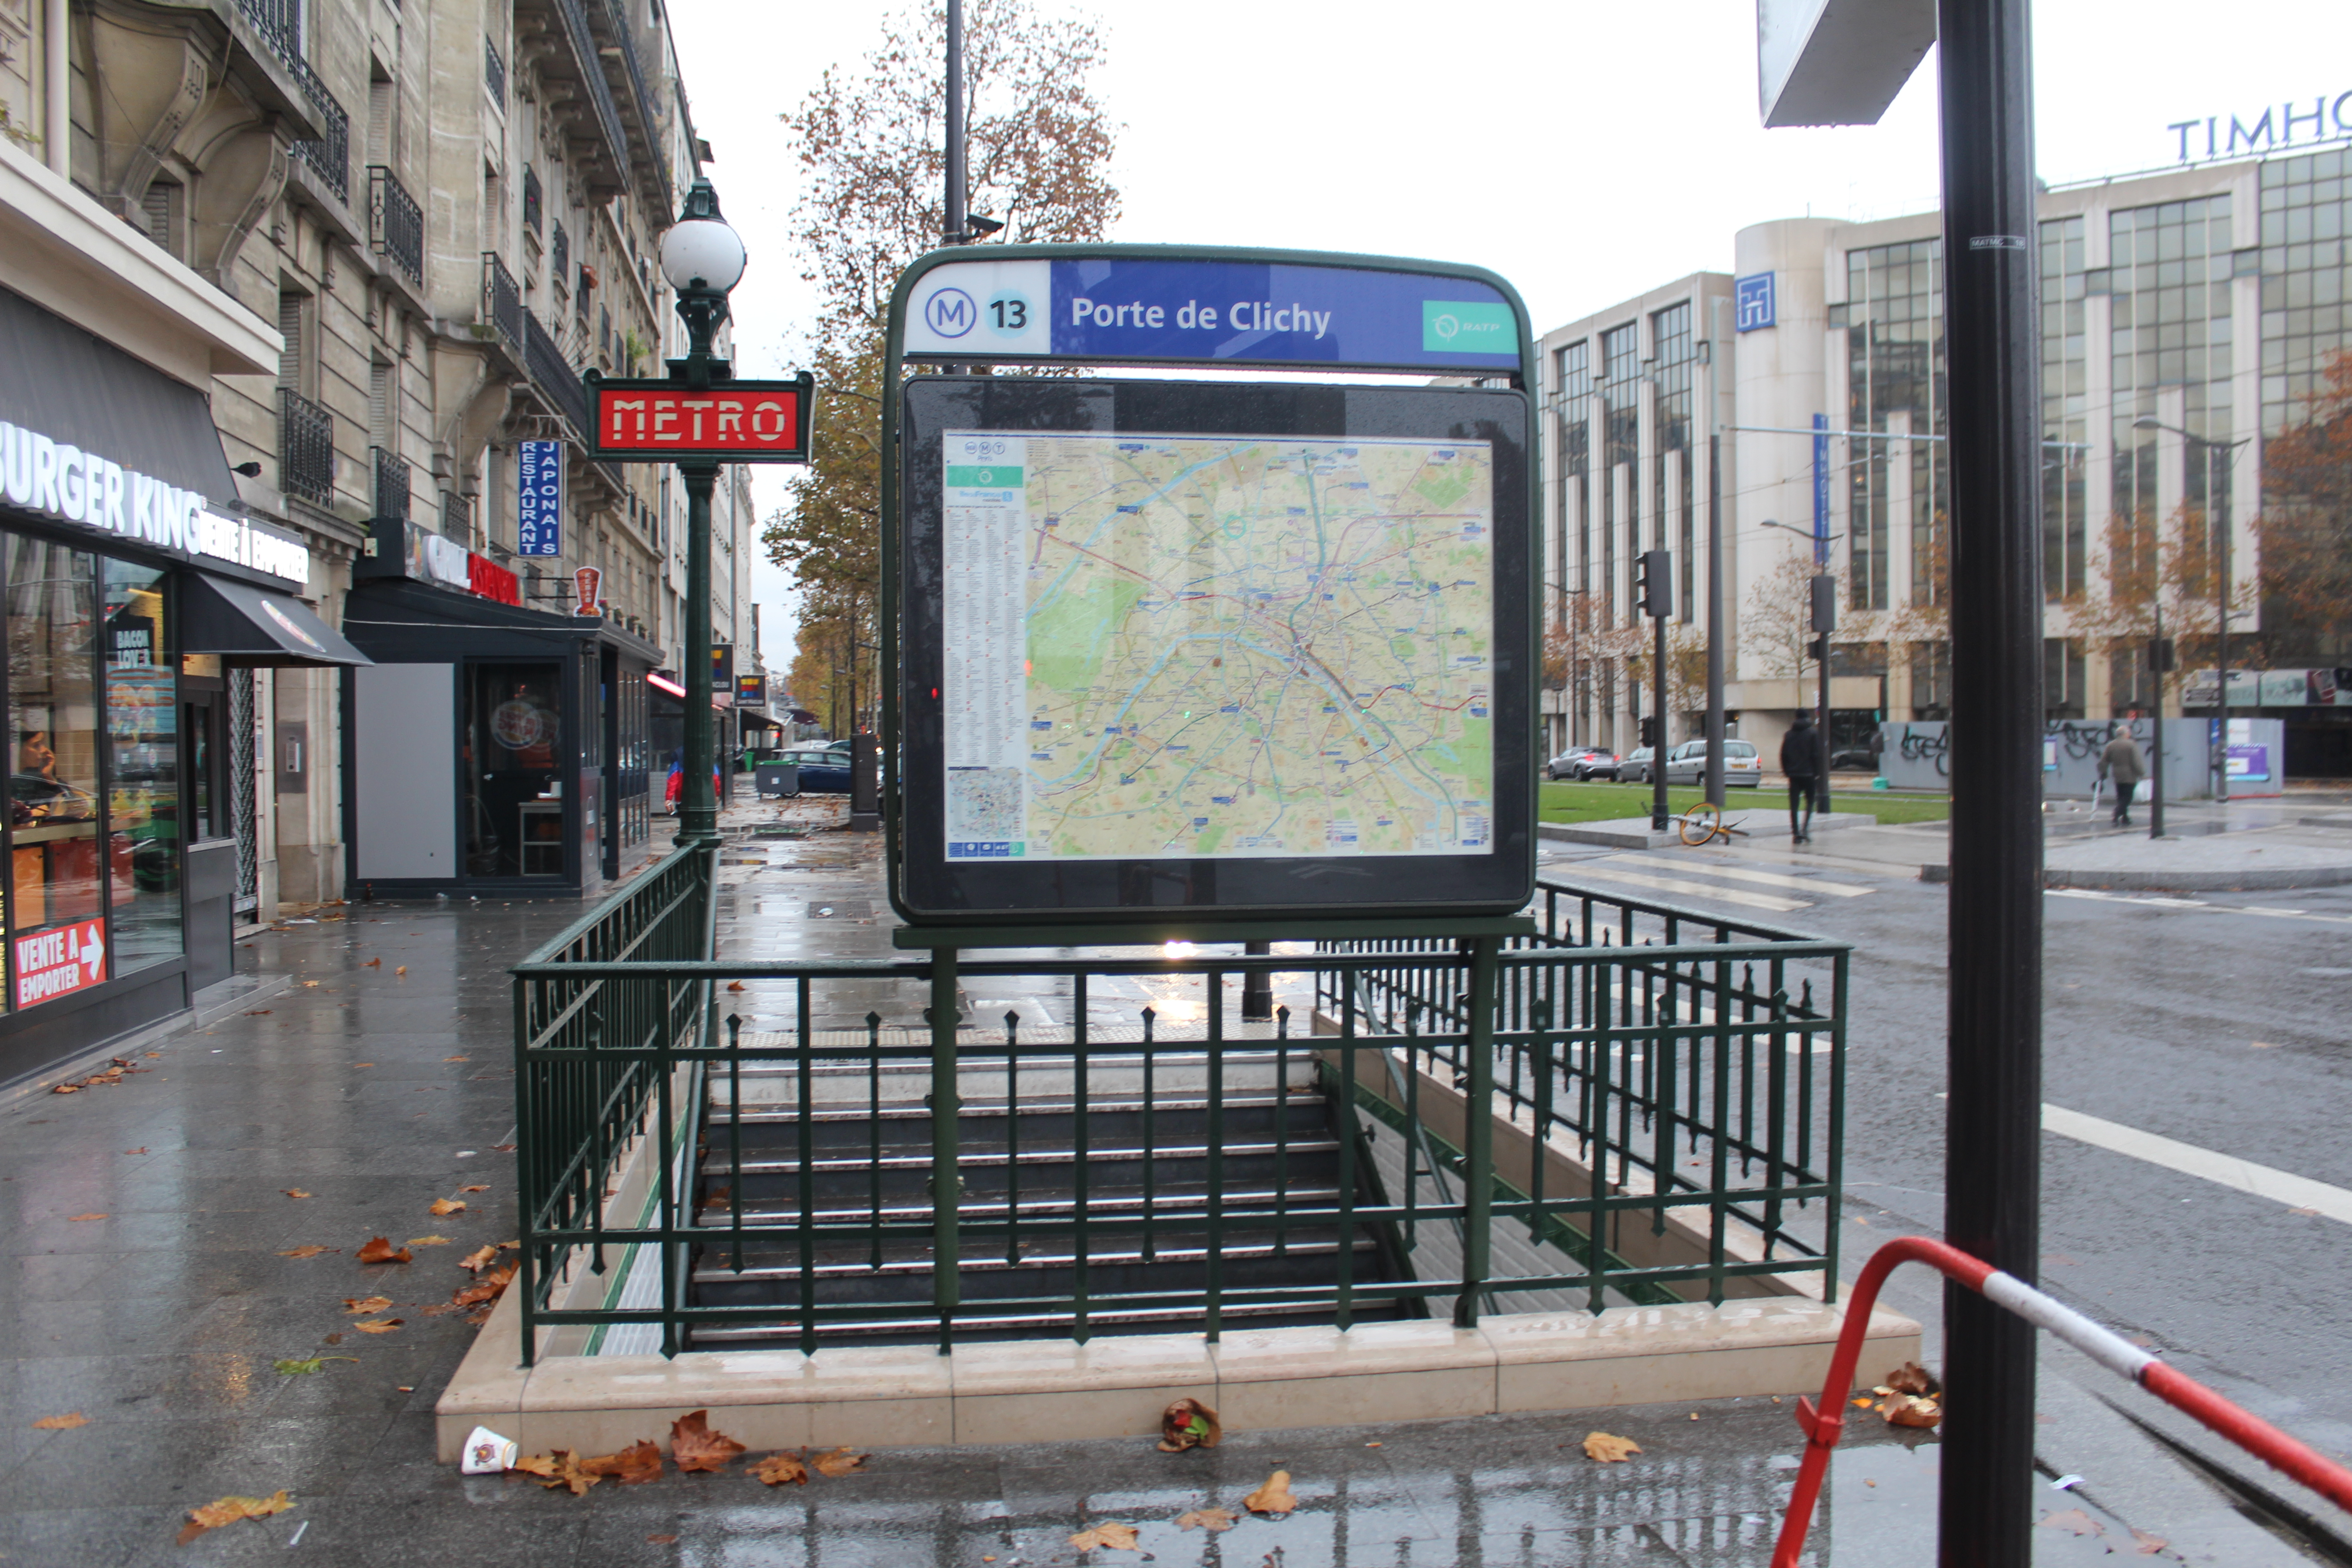 File Entree Station Metro Porte Clichy Paris 1 Jpg Wikimedia Commons